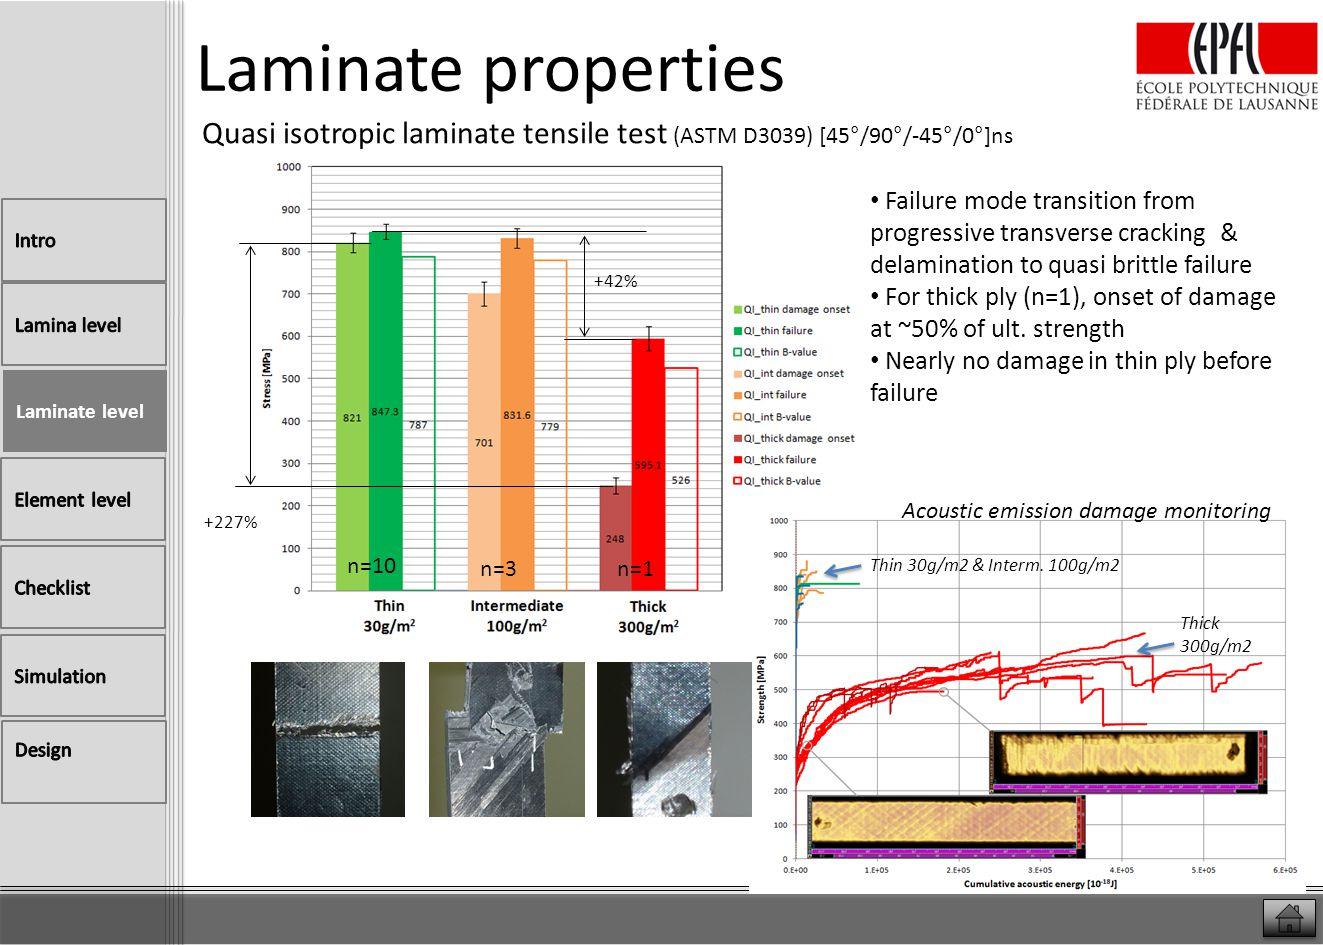 Laminate properties Quasi isotropic laminate tensile test (ASTM D3039) [45°/90°/-45°/0°]ns +42% +227% Thin 30g/m2 & Interm. 100g/m2 Thick 300g/m2 Lami